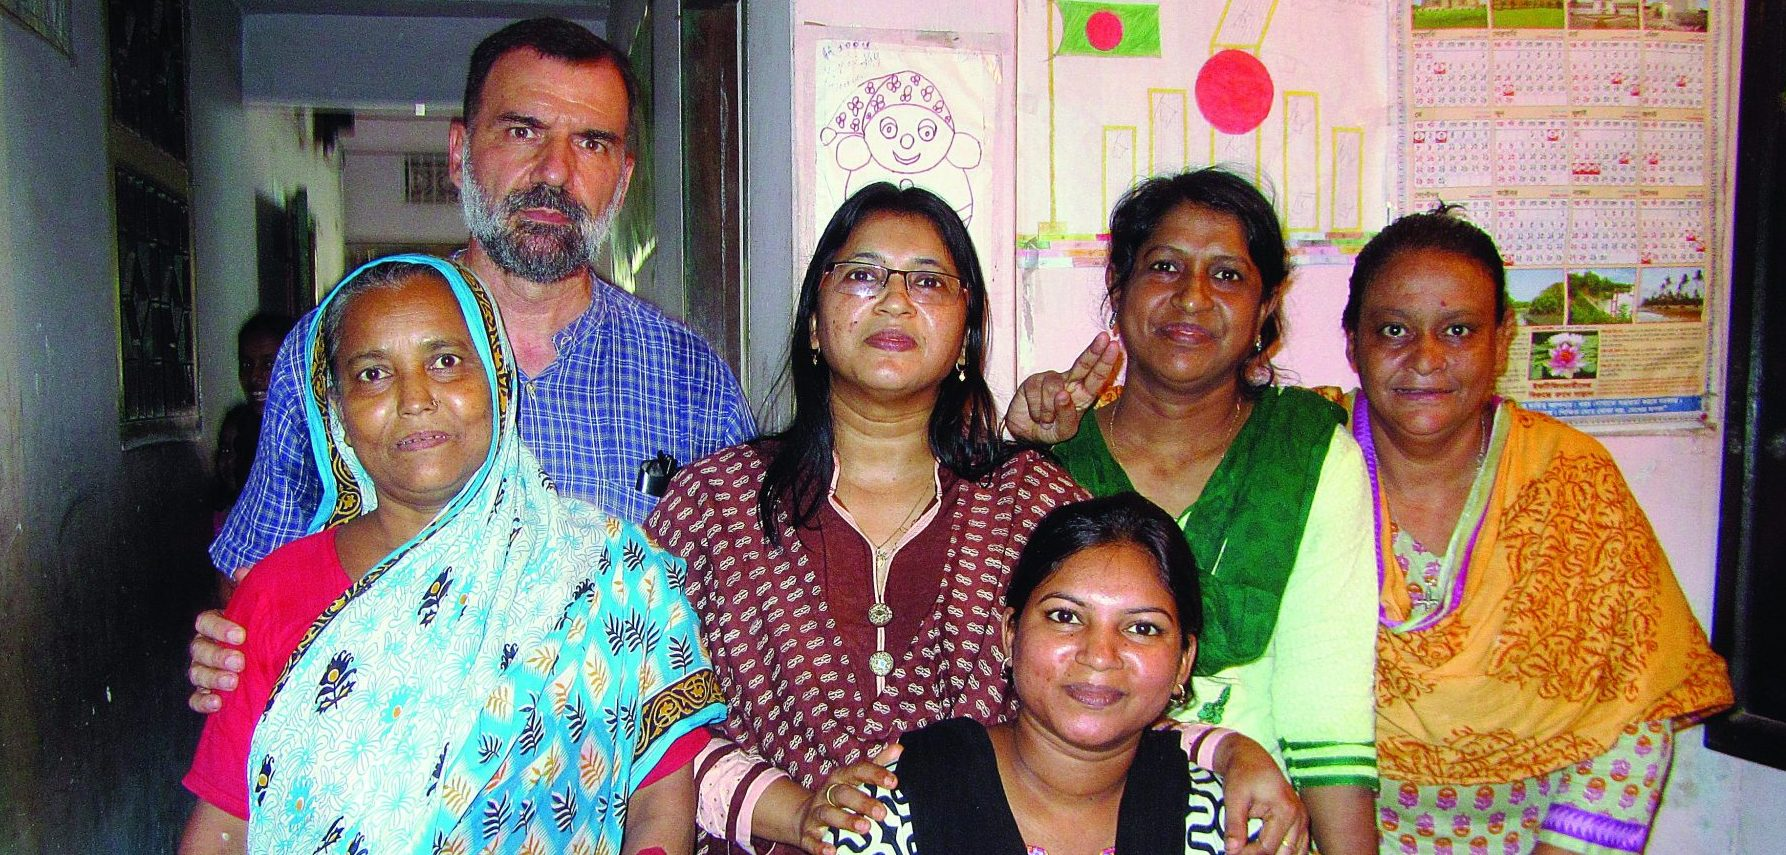 Buon luogo di incontri a Dhaka